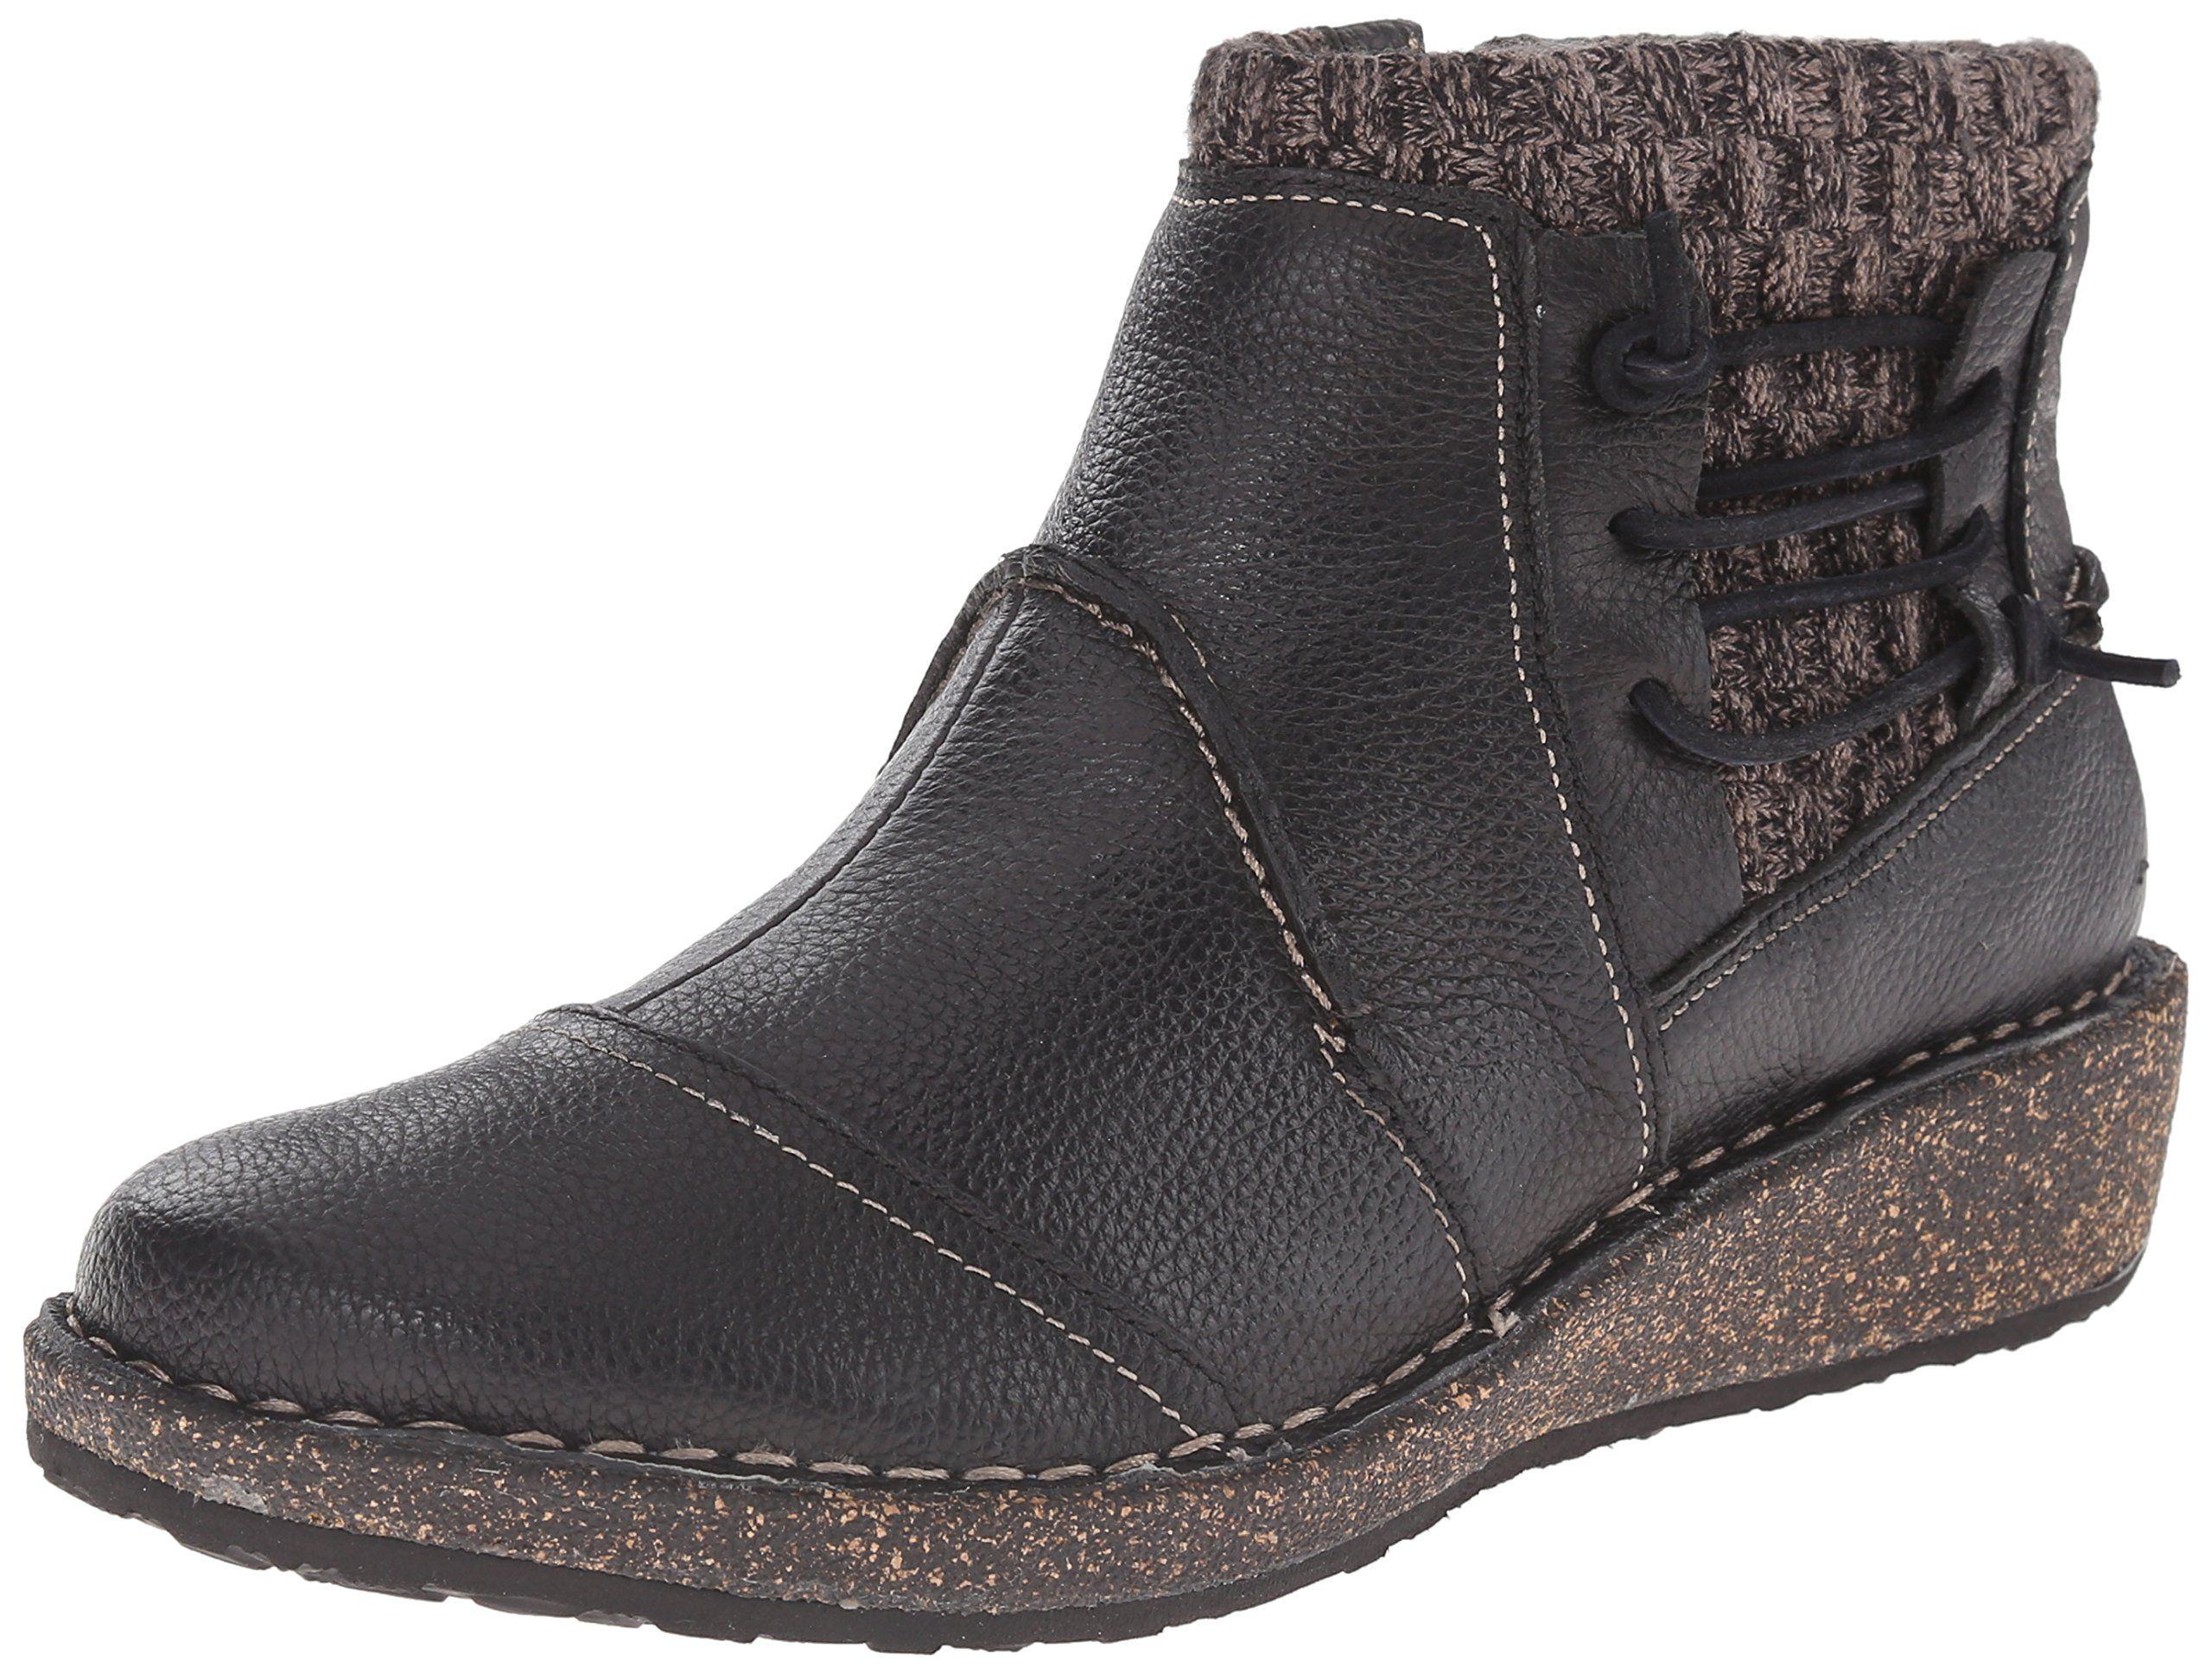 fb8577e0f8411 Aetrex Women's Tessa Short Sweater Boot, Black, 41 EU/10 M US. Heel ...